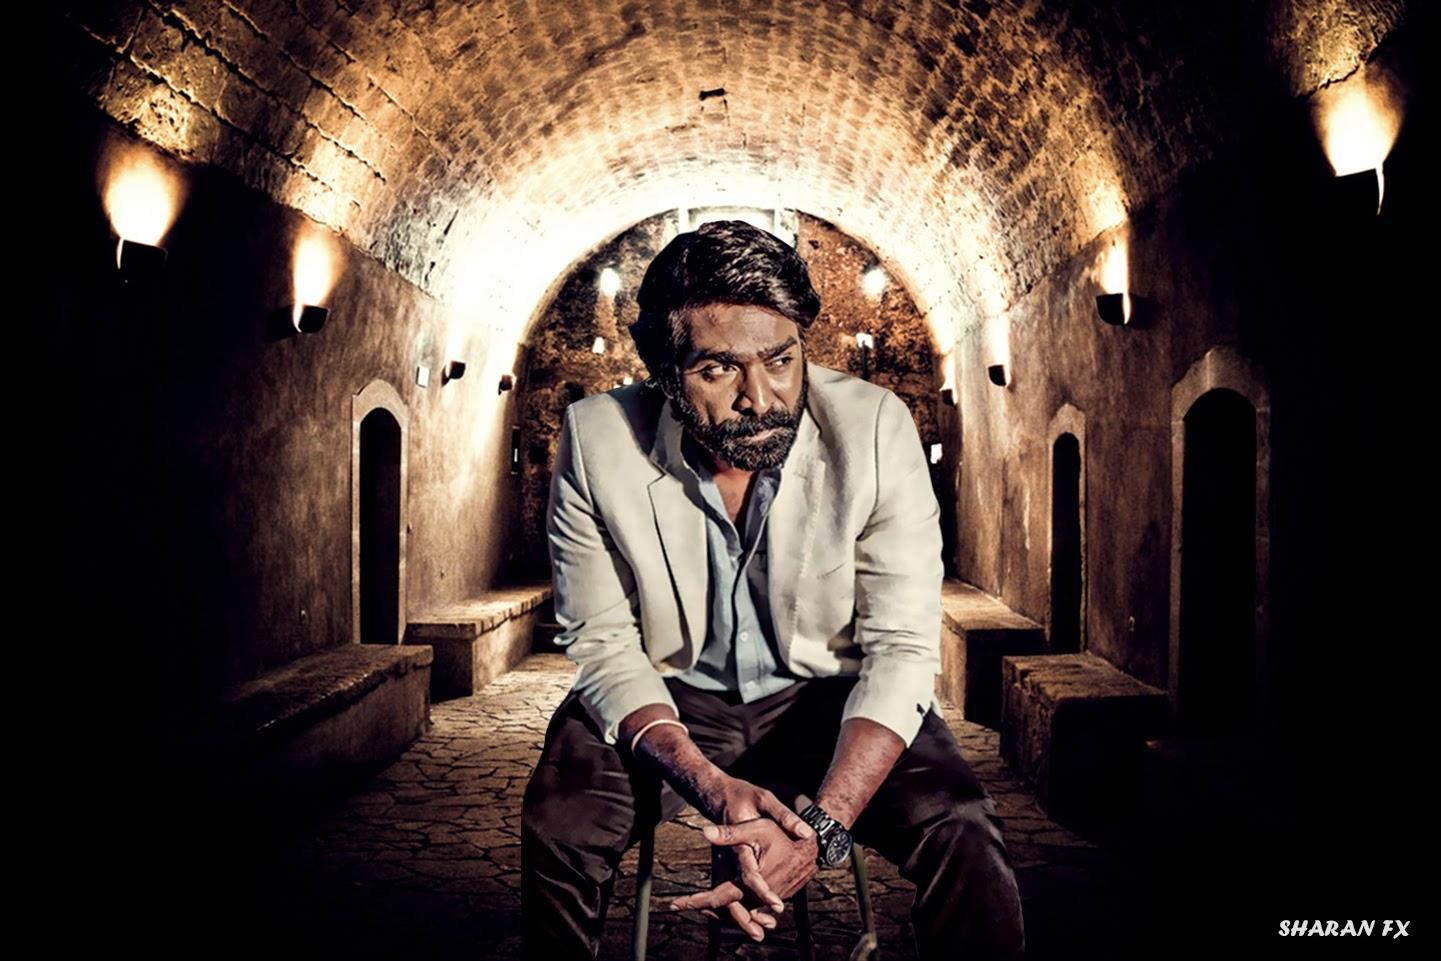 Phenomenal Pictures Makkal Selvan Vijay Sethupathi Rare Images Here is the photo gallery of actor vijaya gurunatha sethupathi, well known his stage name vijay sethupathi. makkal selvan vijay sethupathi rare images